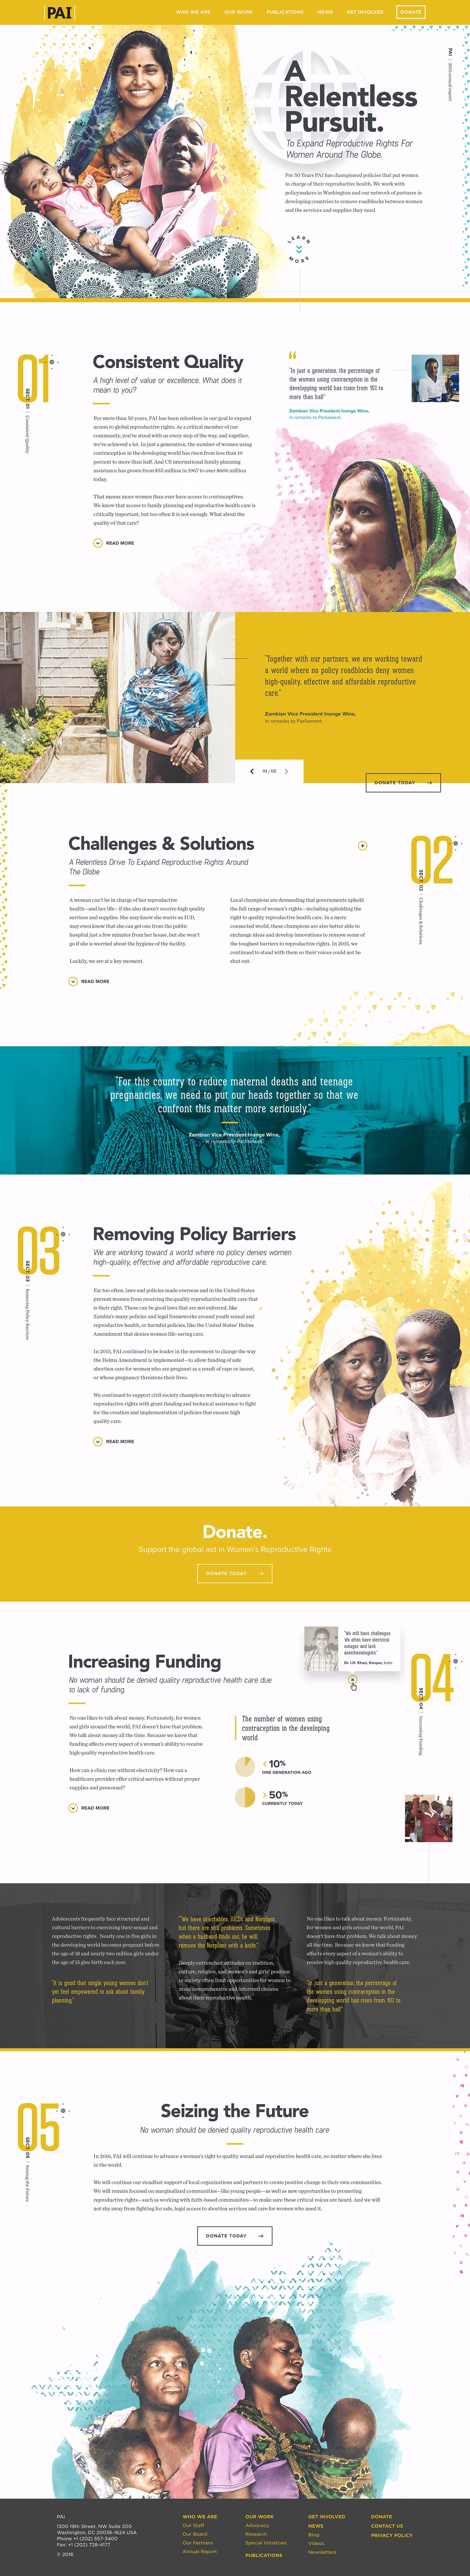 Pai Annualreport 2015 Jpg By Forefathers Layout Design Web Design Nonprofit Design